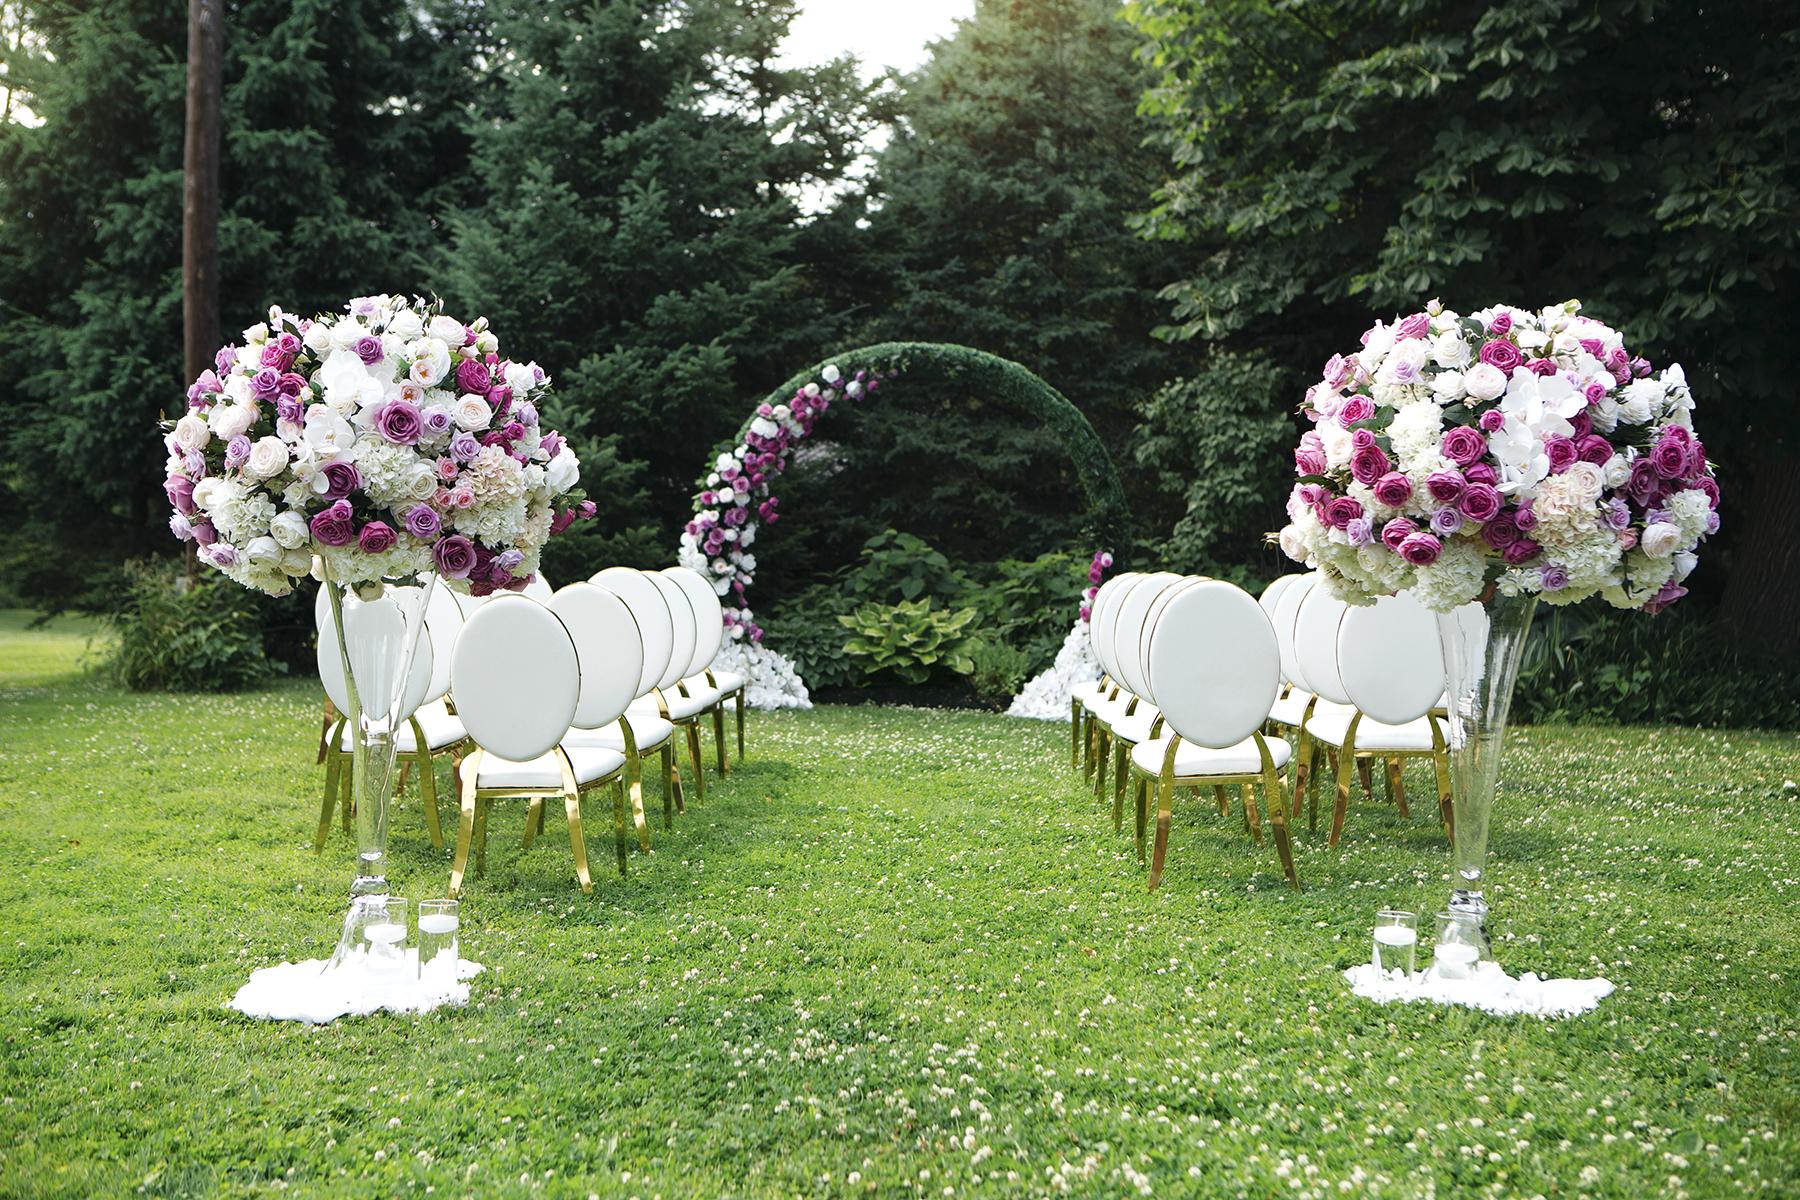 My backyard dream wedding